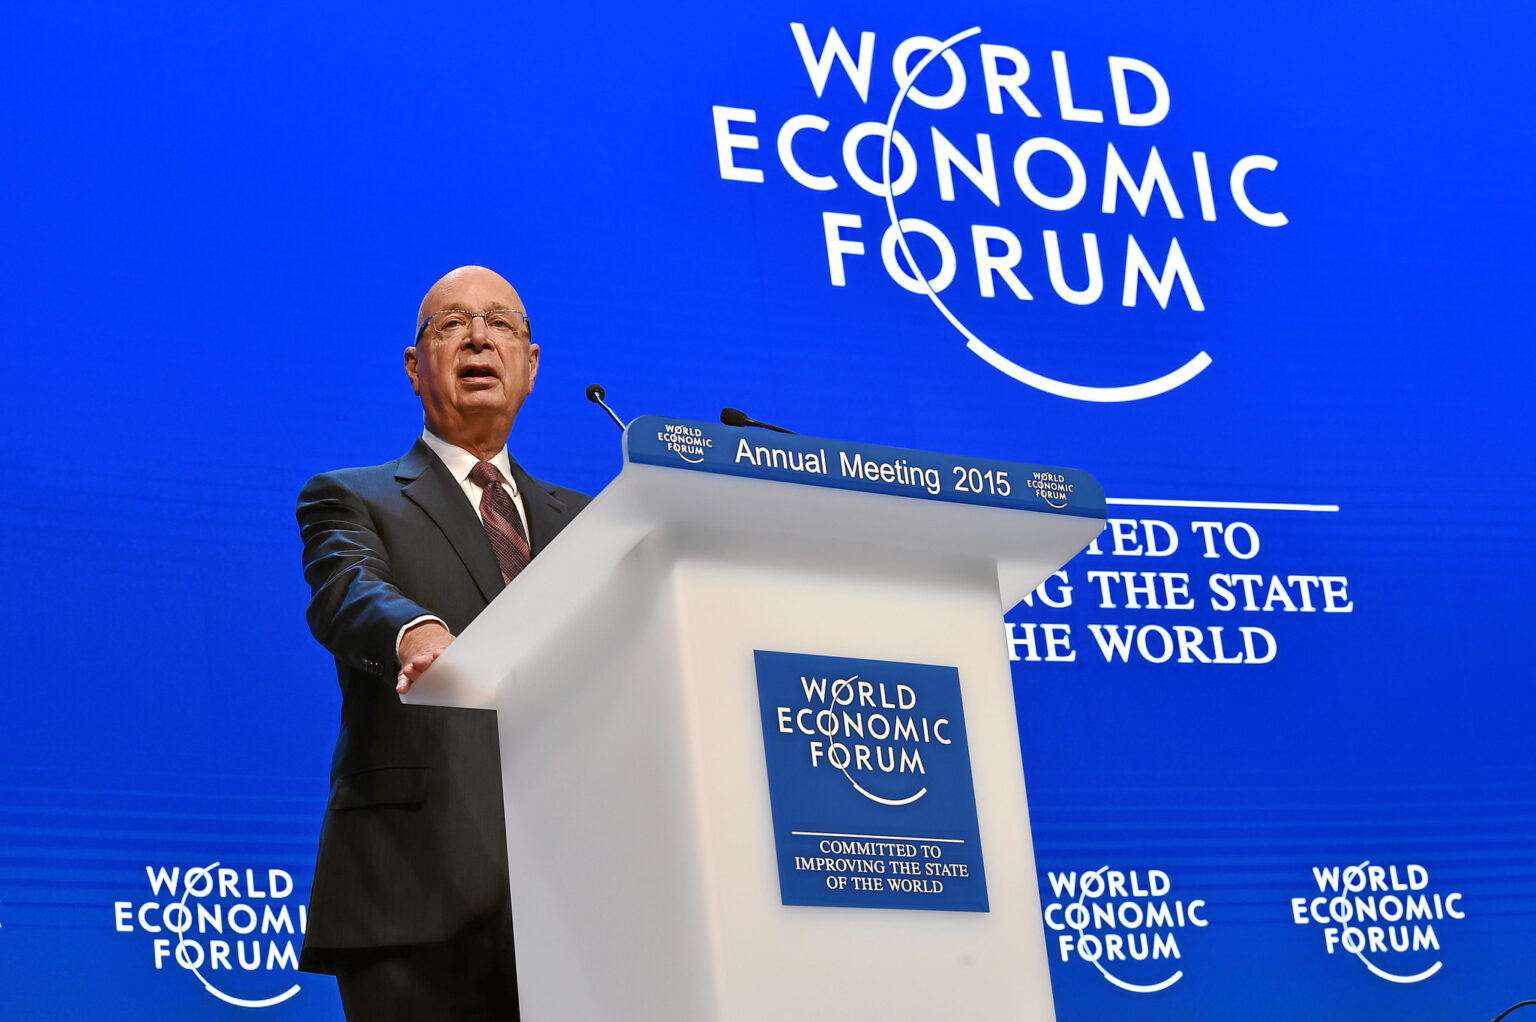 World Economic Forum blueprint for humanity